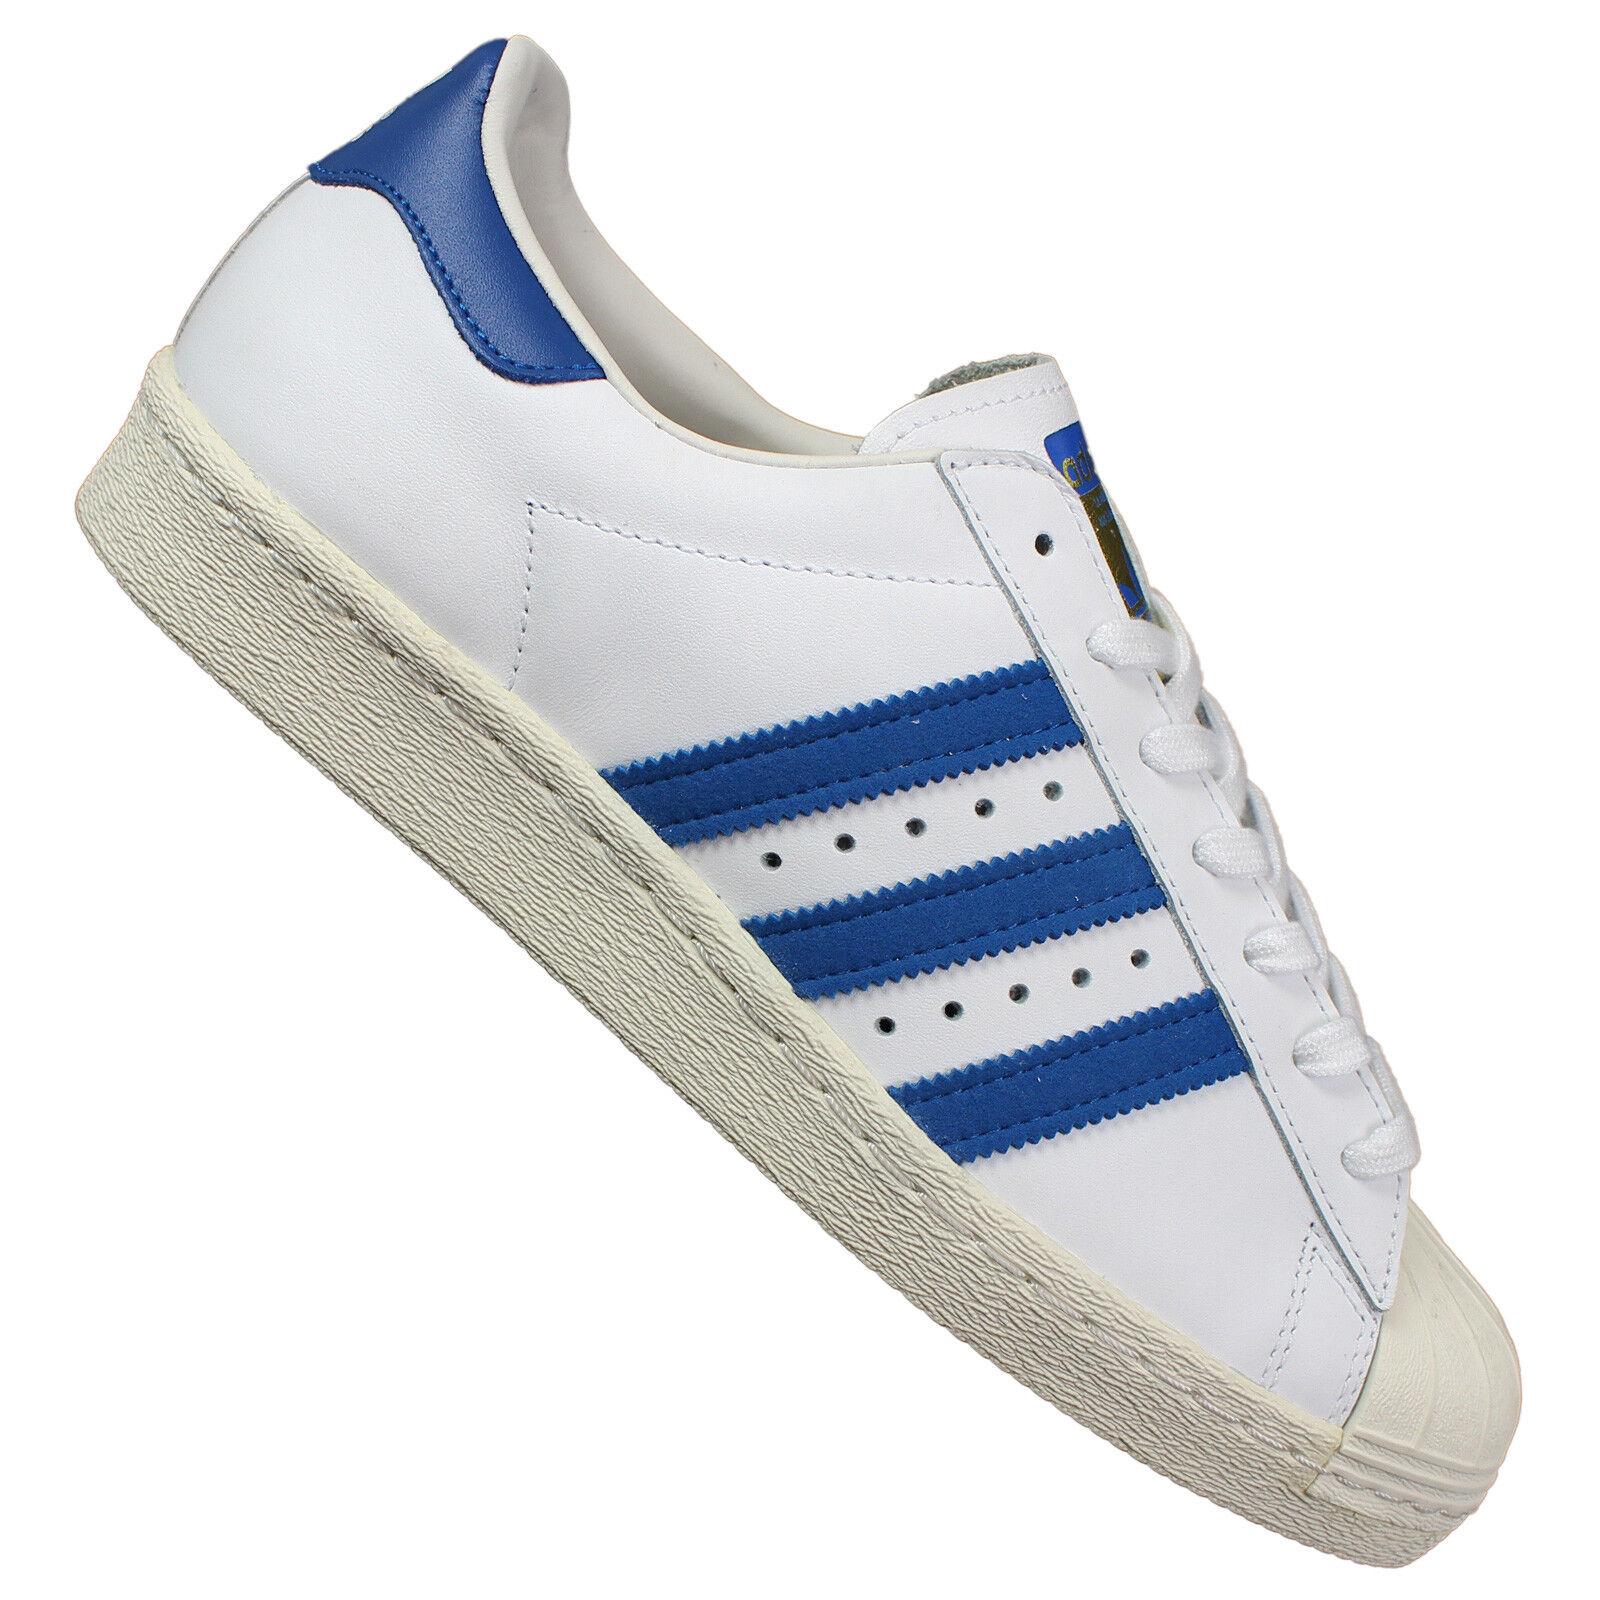 ADIDAS ORIGINALS SUPERSTAR 80S Homme Cuir Chaussures baskets sneakers